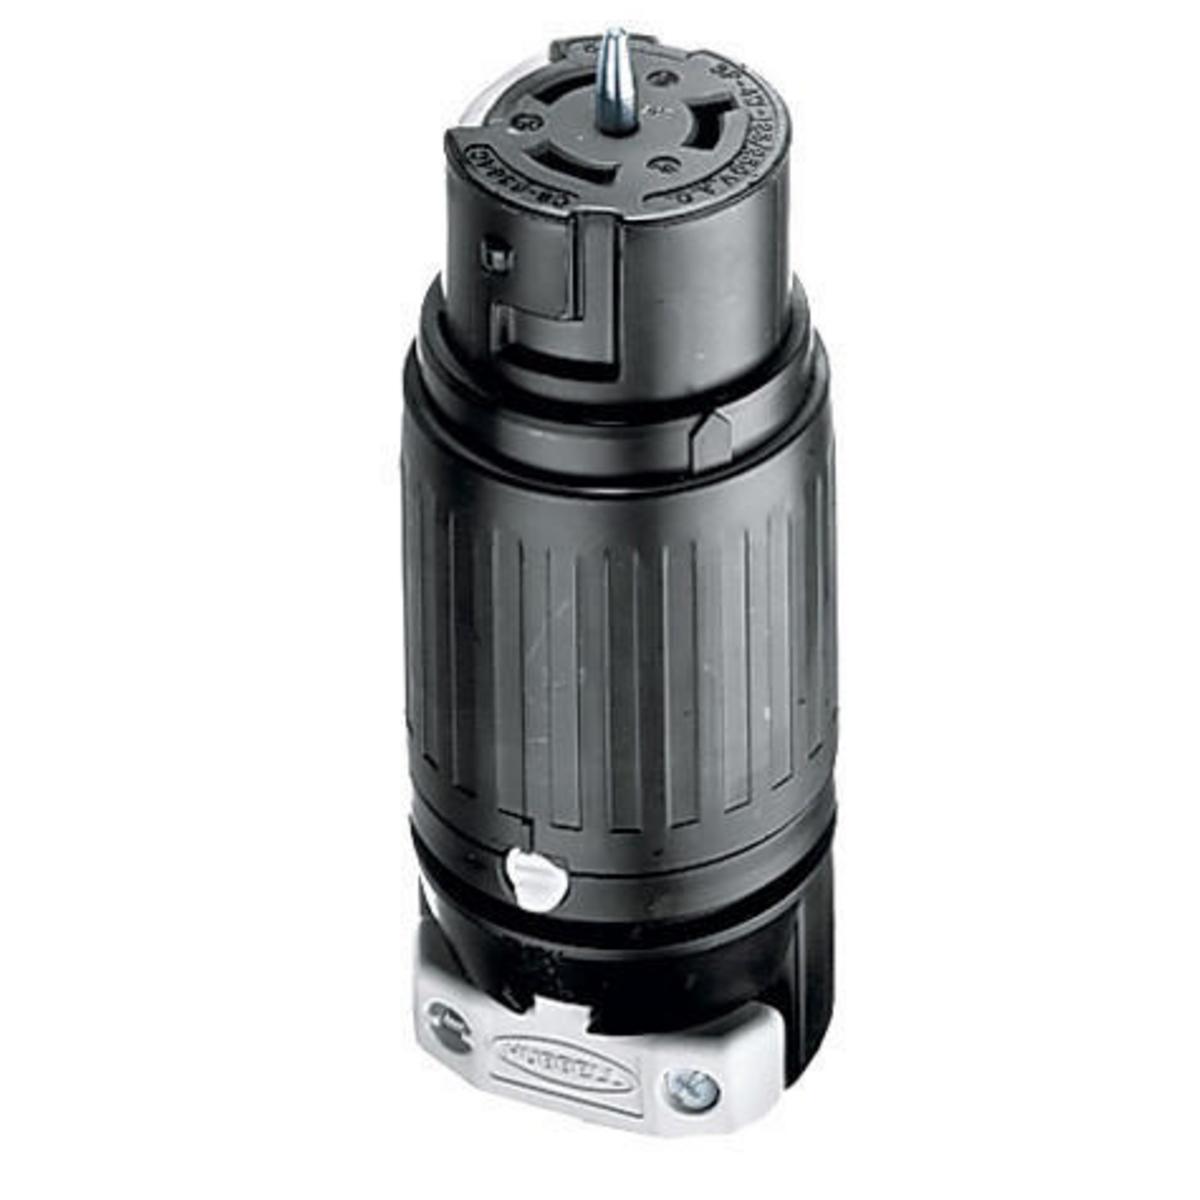 hubbell plug CS6360